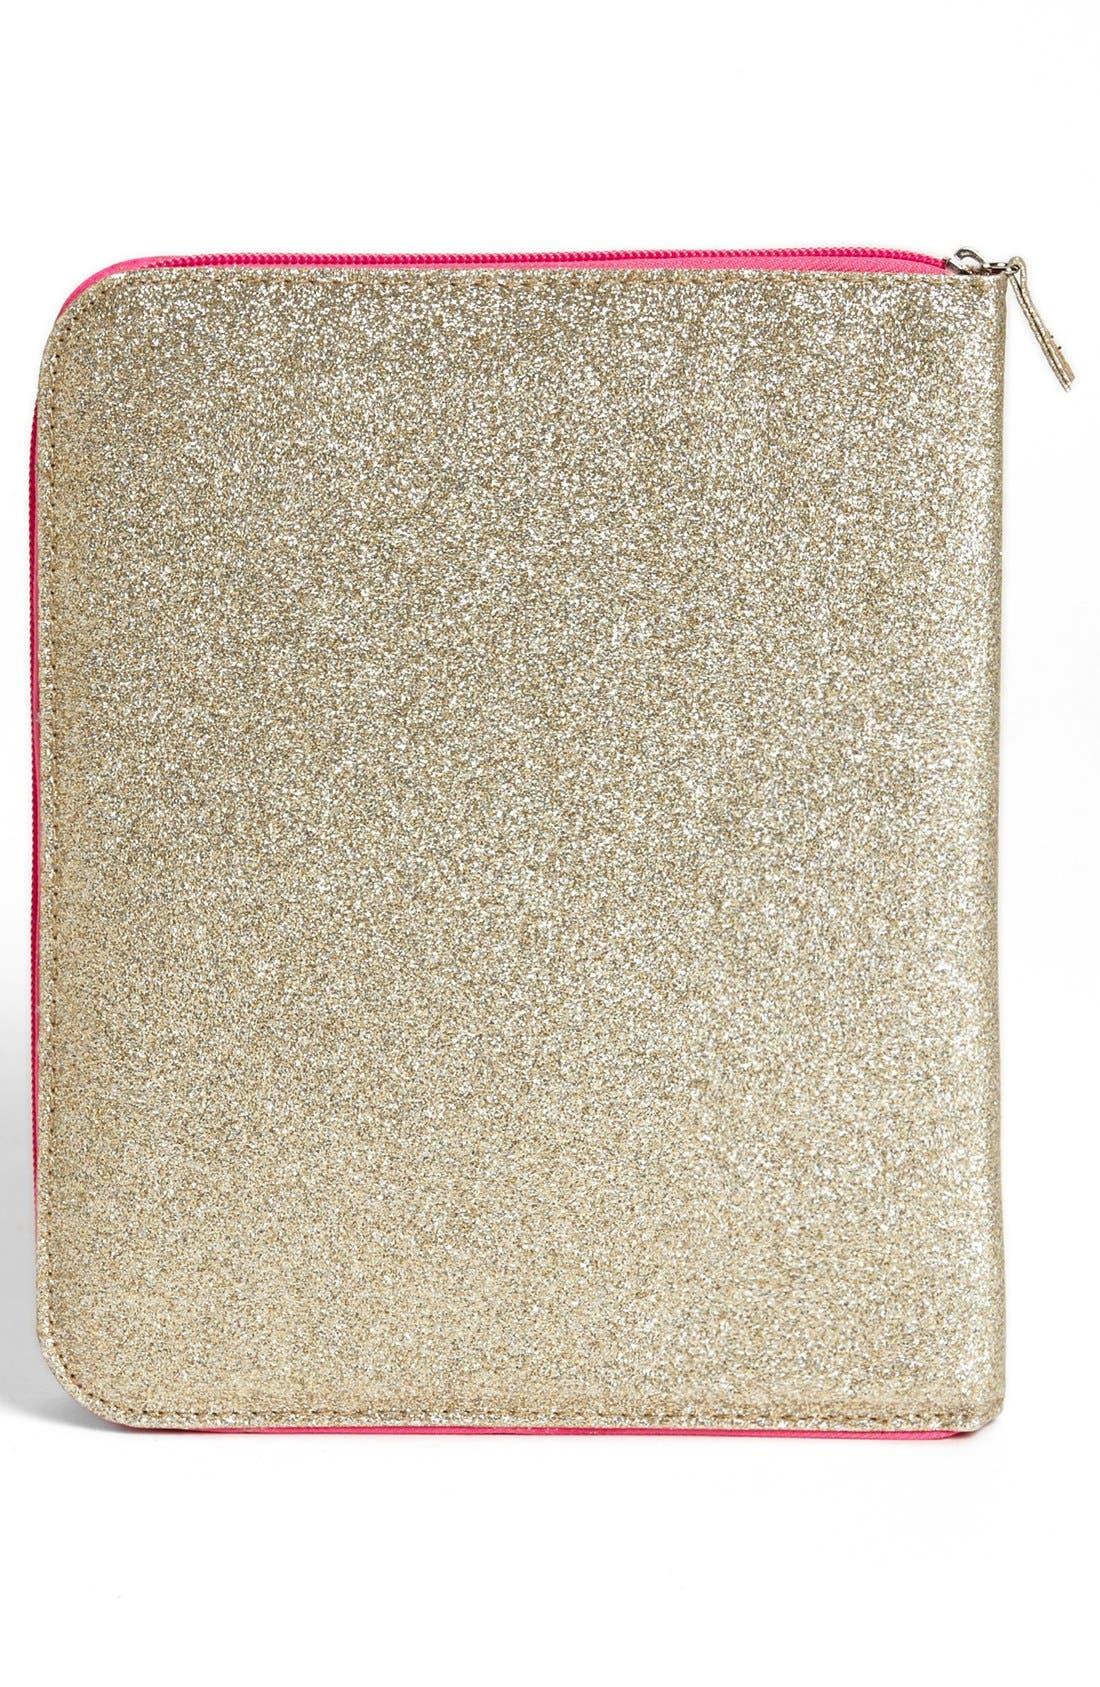 Alternate Image 4  - Capelli of New York iPad Case (Girls)